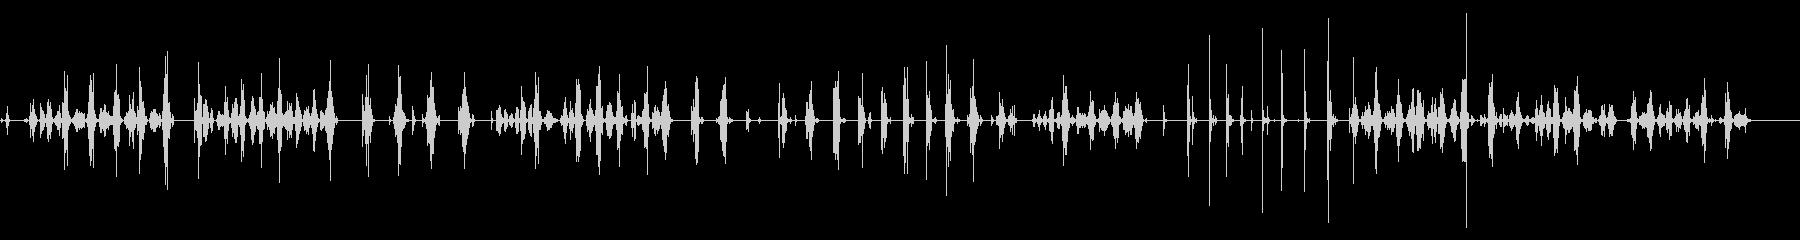 ICE:連続スクレイピングアイス&...の未再生の波形